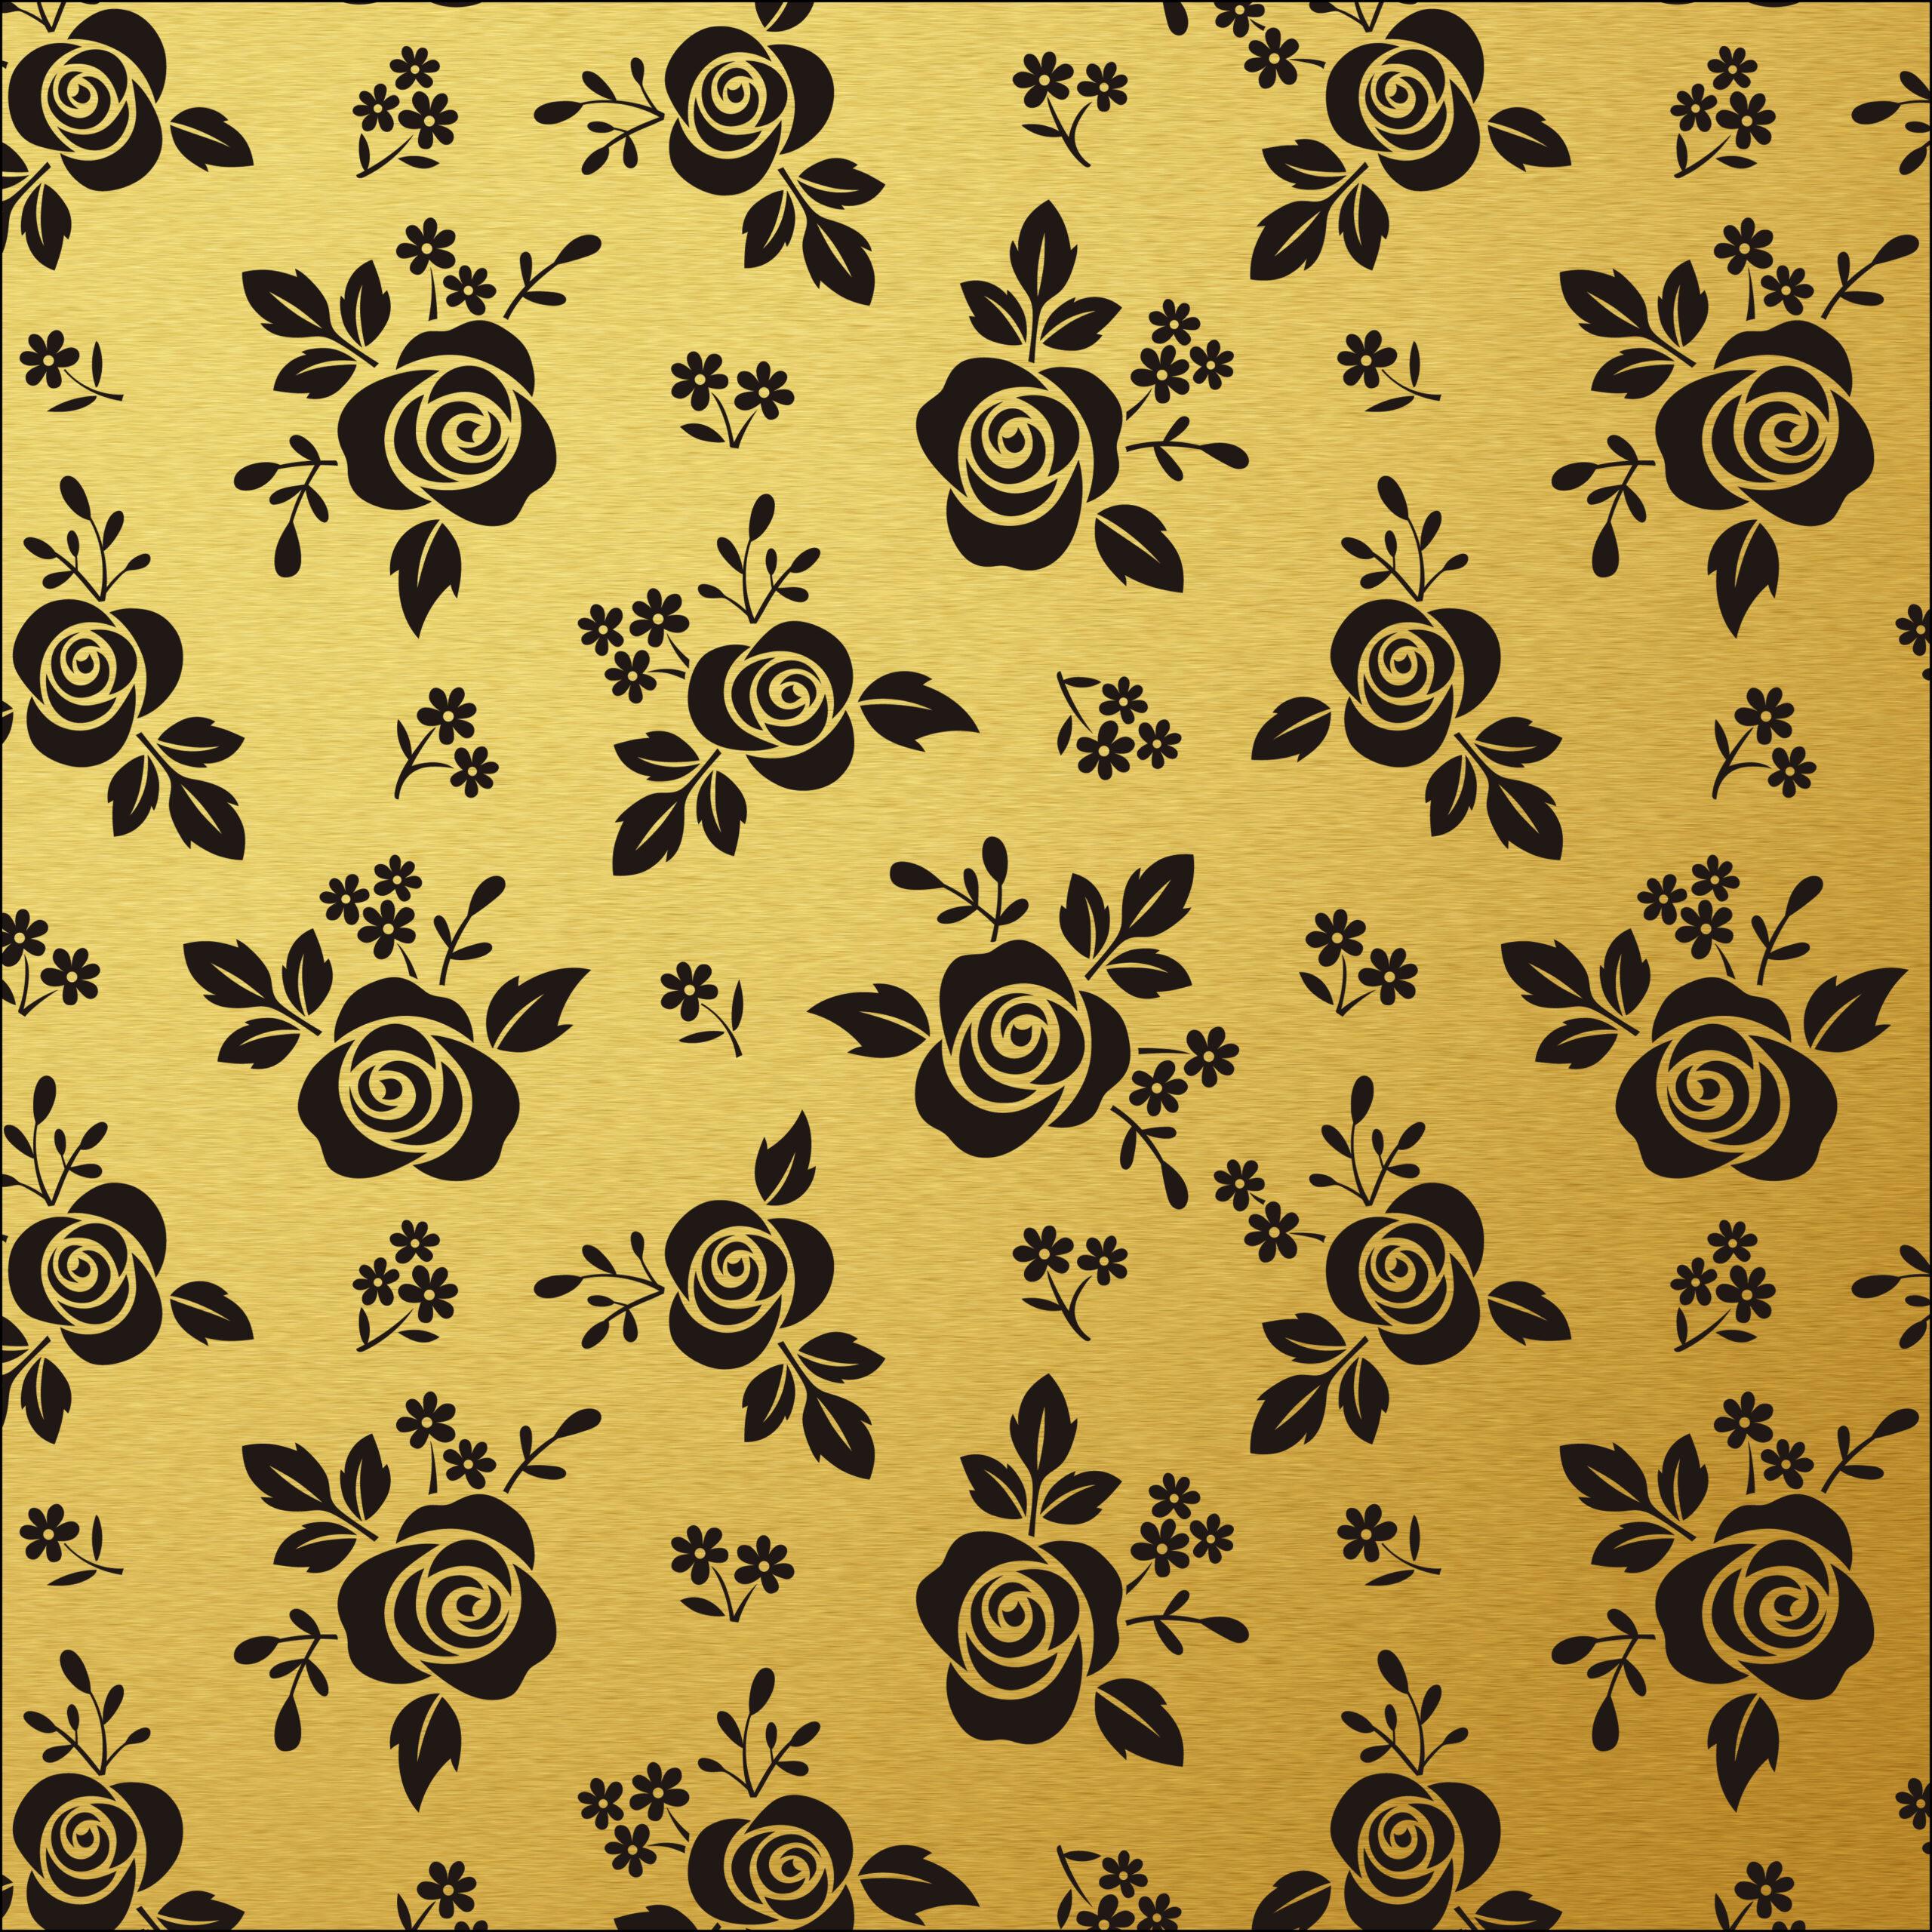 Magnificent Wall Art Using Scrapbook Paper Composition - Art & Wall ...